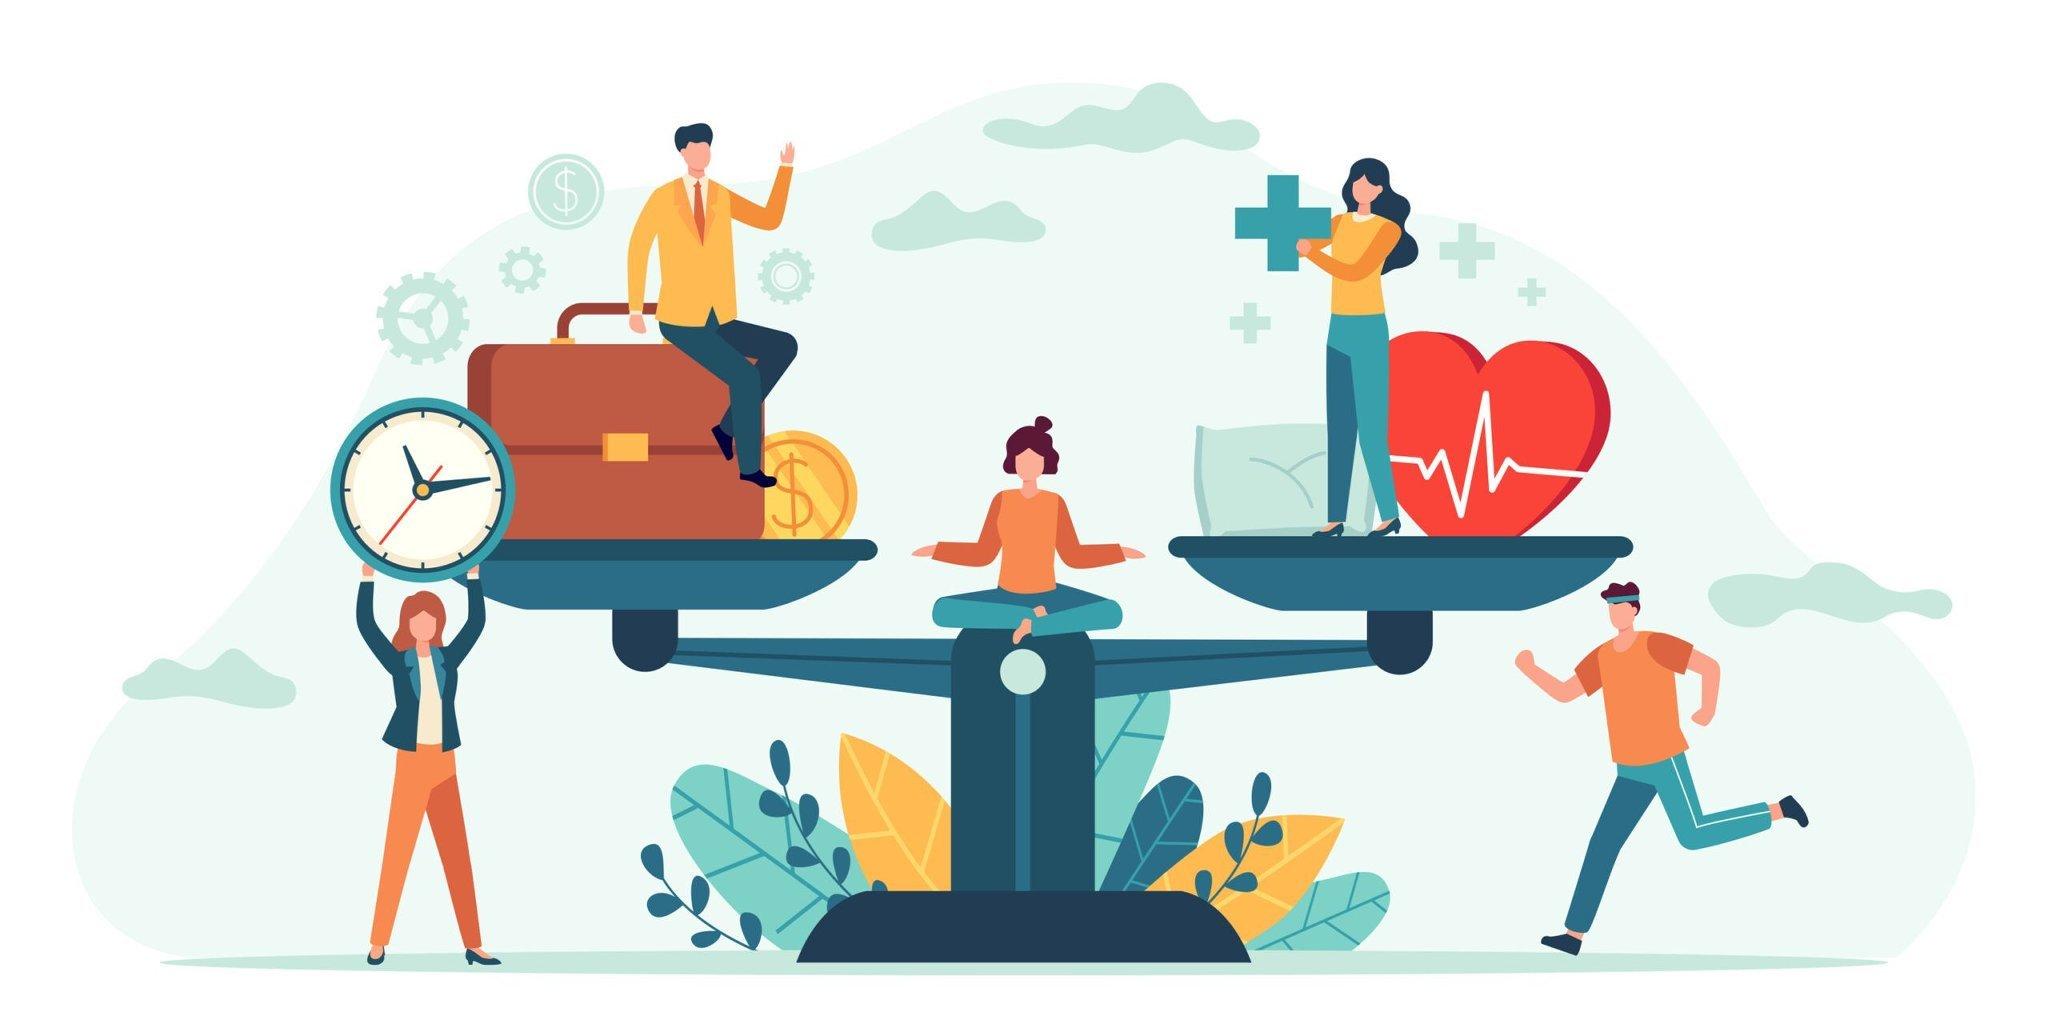 Jobs For Those Needing a Better Work Life Balance